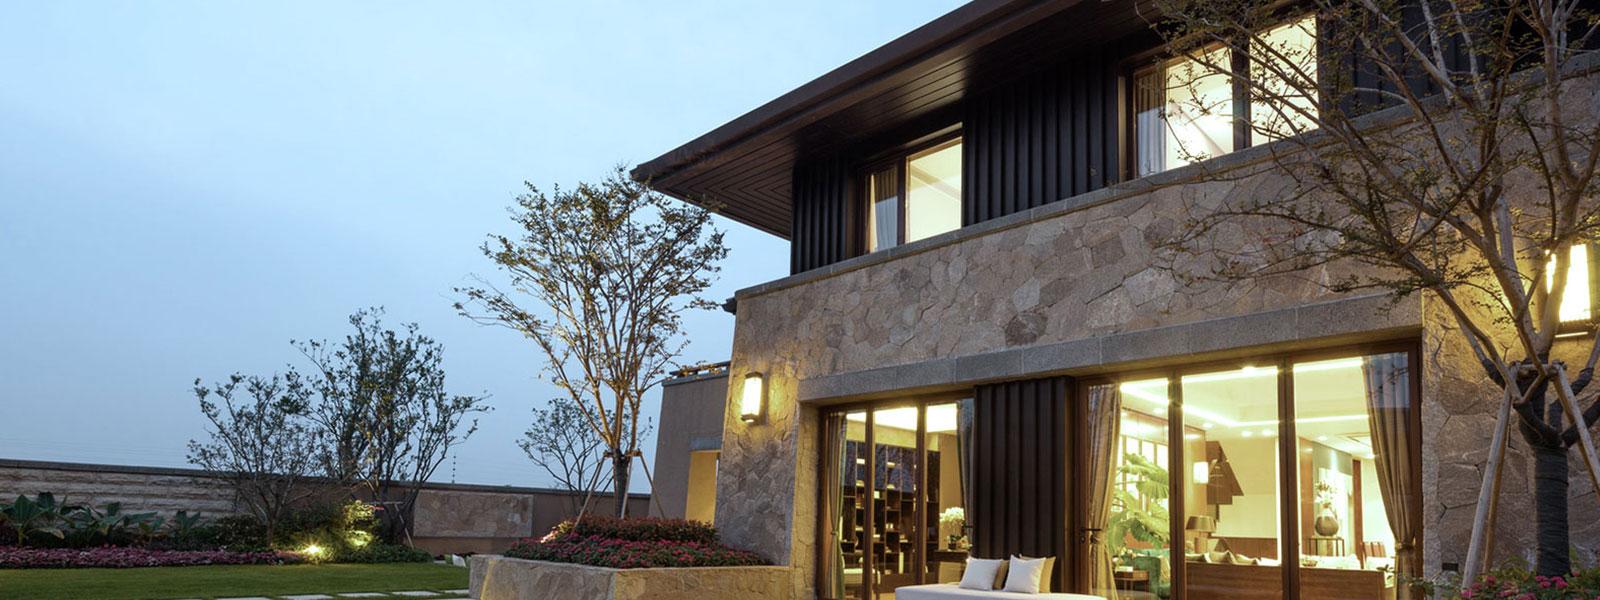 Long Island's Premiere Real Estate Company